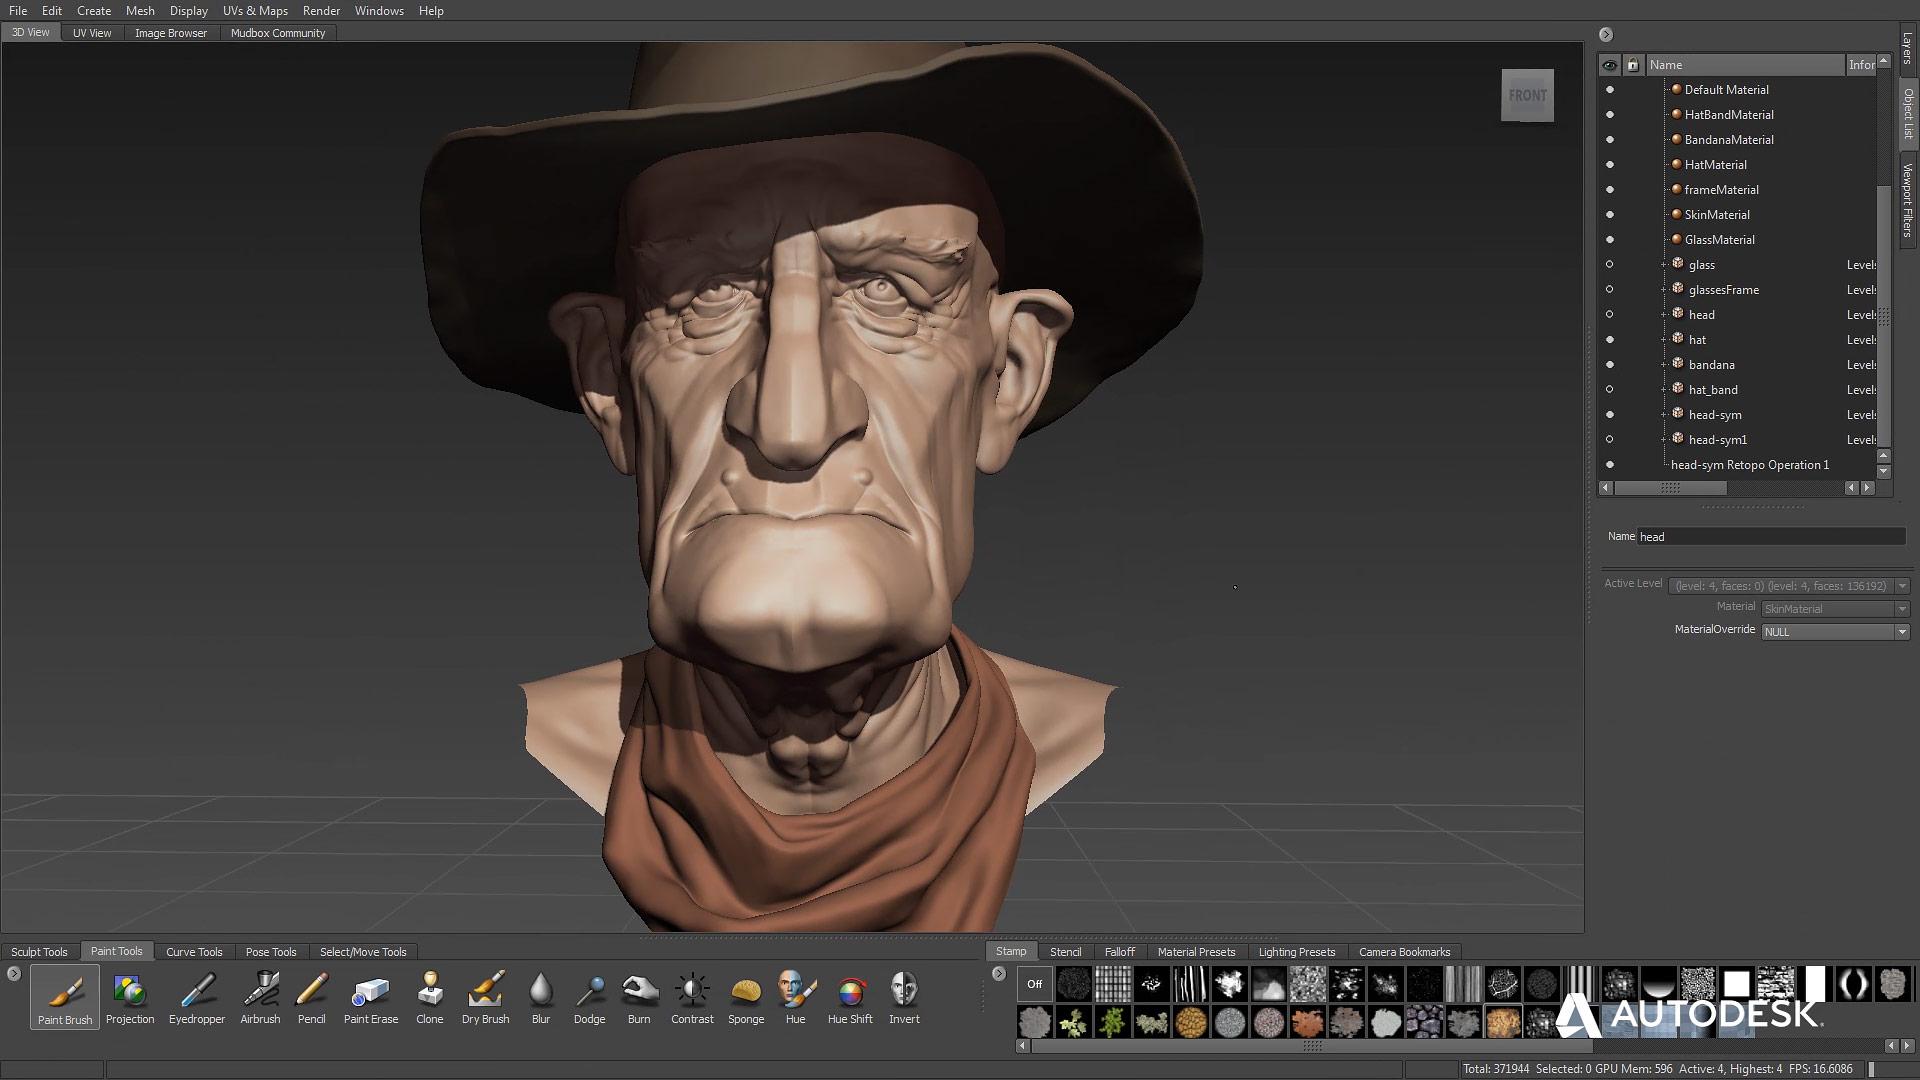 Autodesk Mudbox 2019 Mac 破解版 3d数字绘画和雕刻软件-麦氪搜(iMacso.com)